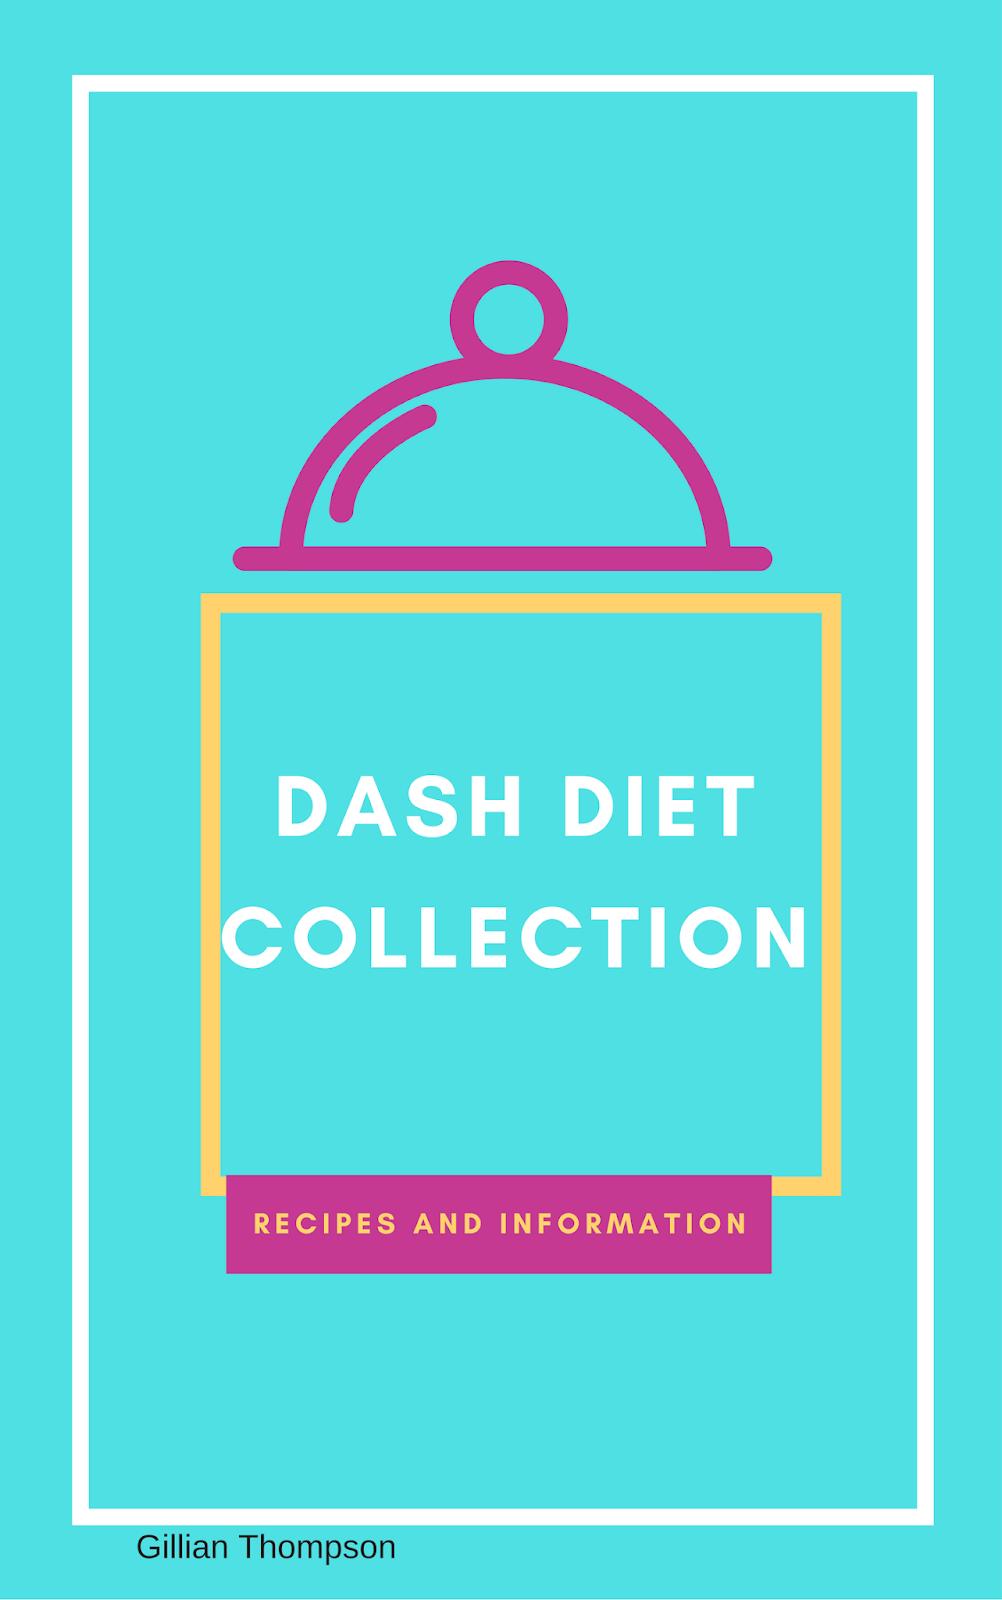 DASH Diet Meal Plan Phase 1 Dash diet meal plan, Dash